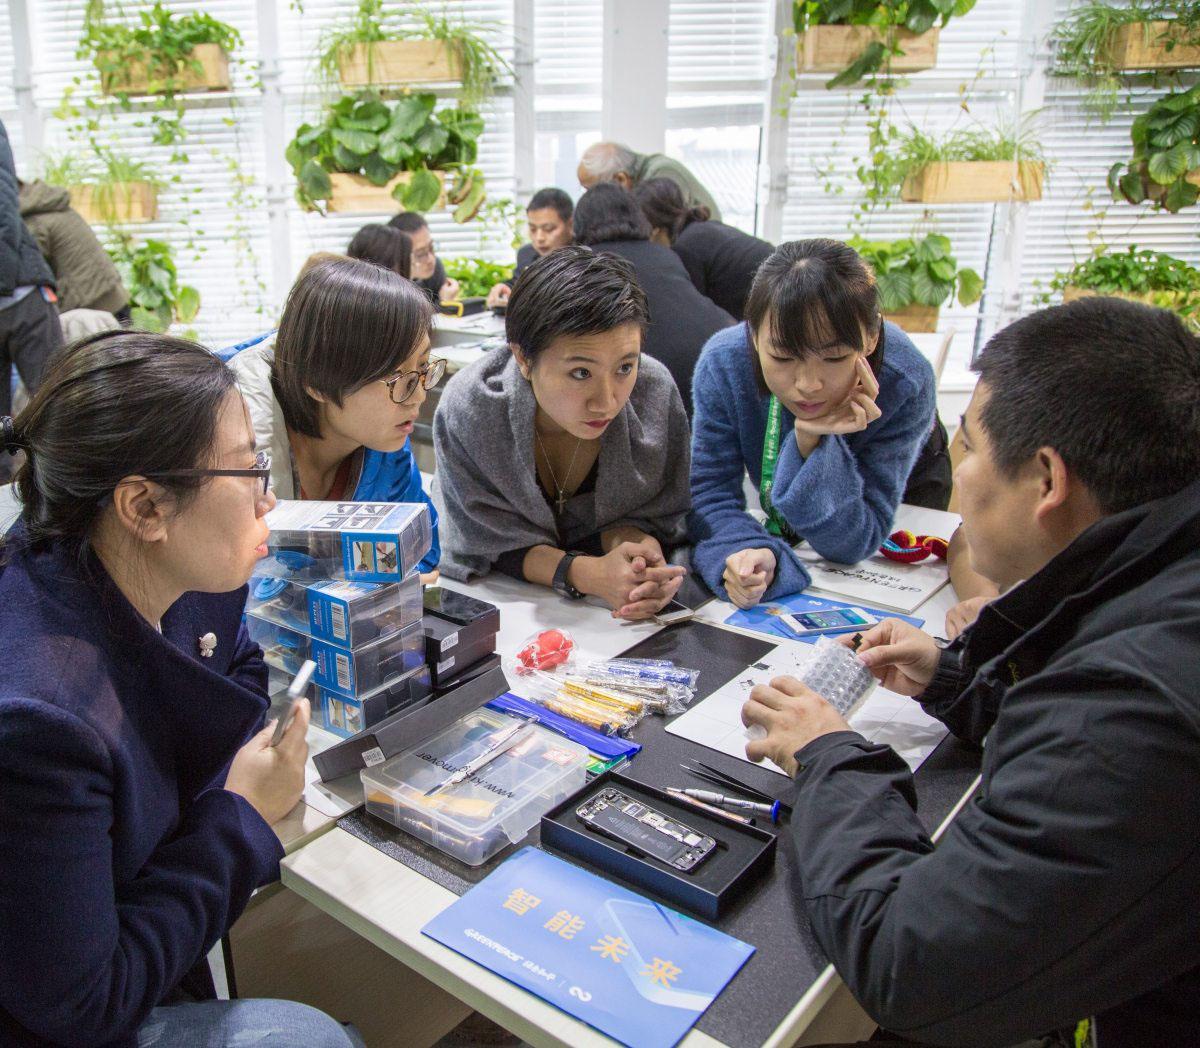 Auch in vielen anderen Ländern bietet Greenpeace Repair Cafés an, wie hier in Peking.